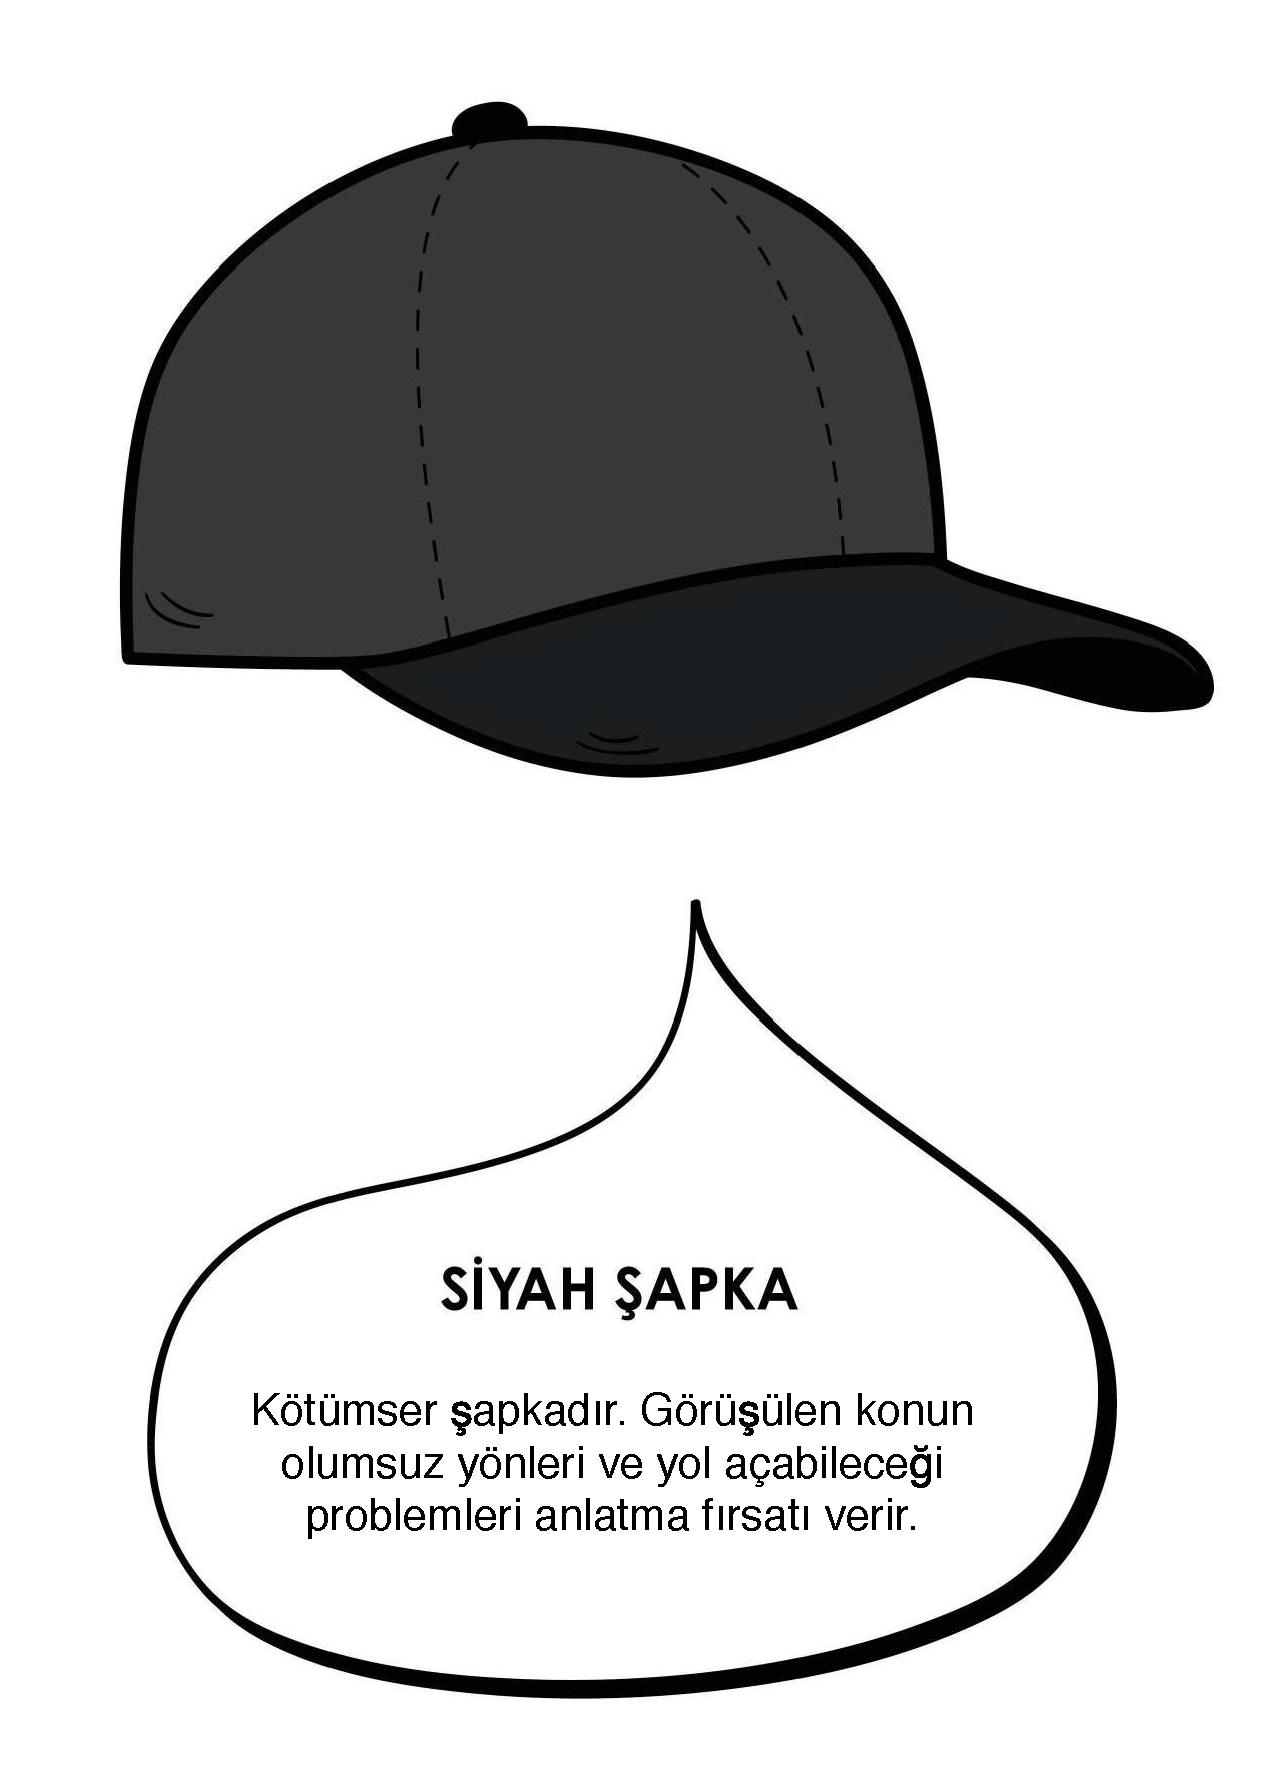 3)Siyah Şapka : KÖTÜMSERLİK